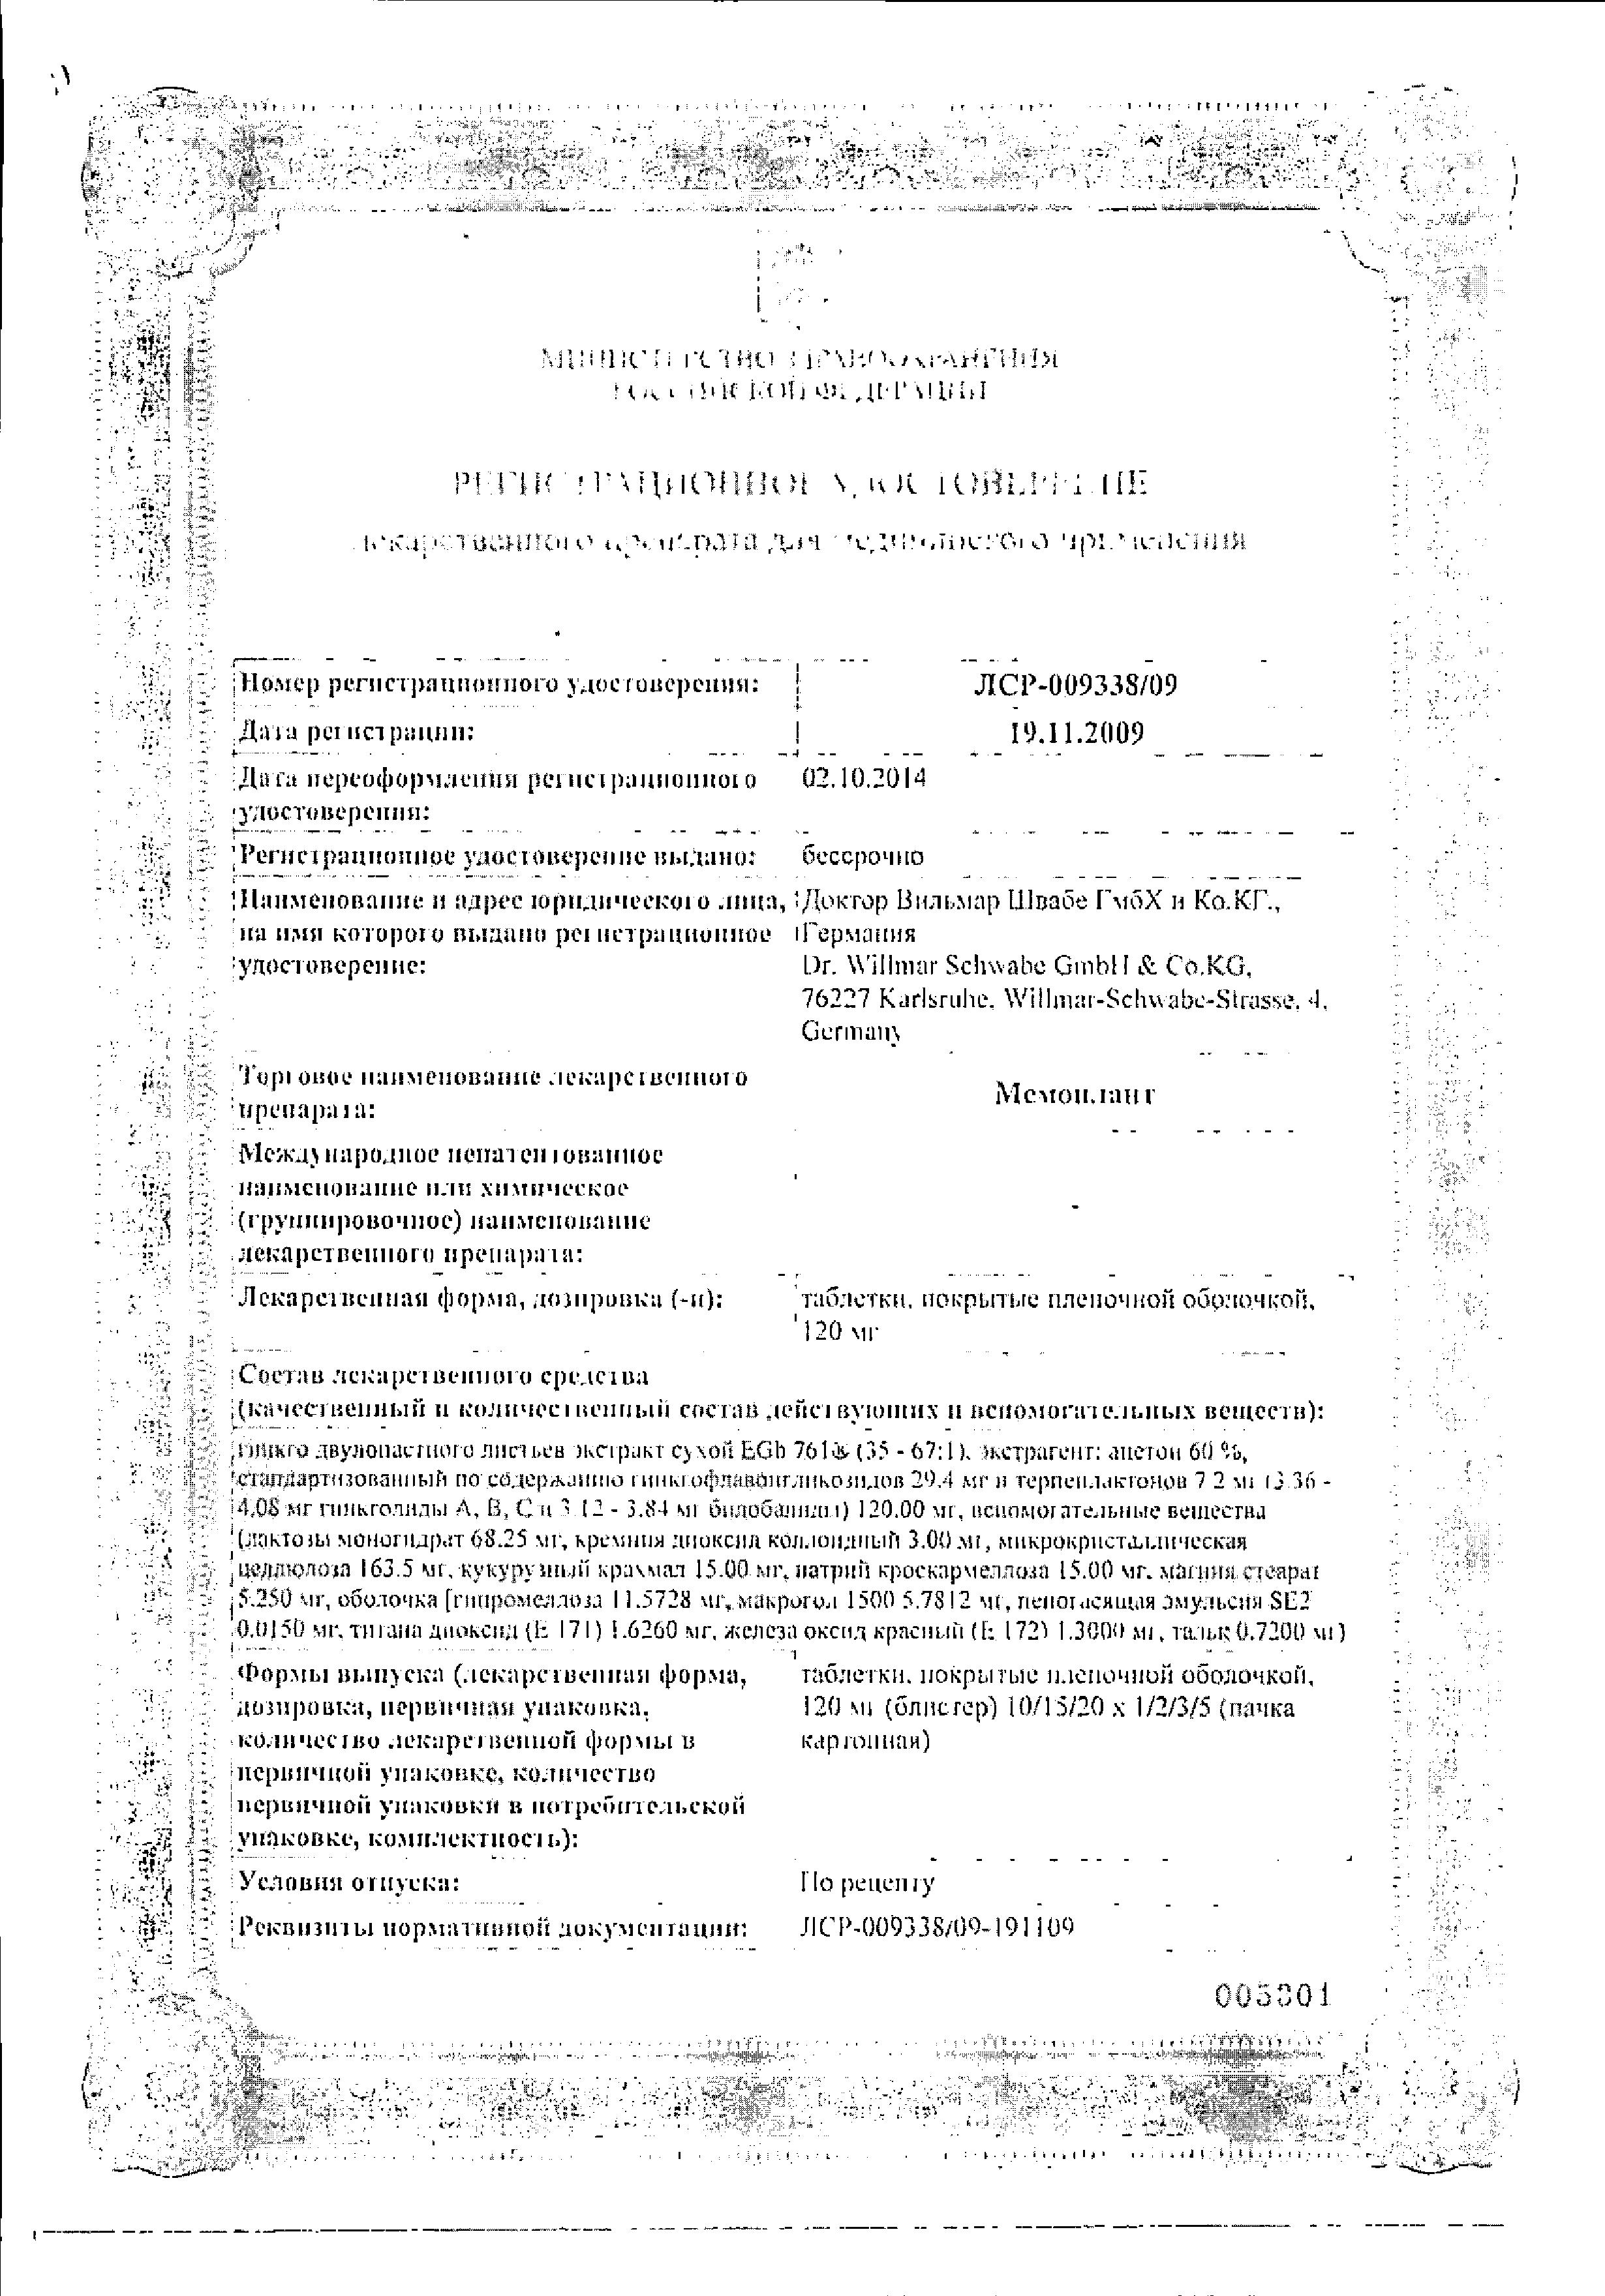 Мемоплант сертификат